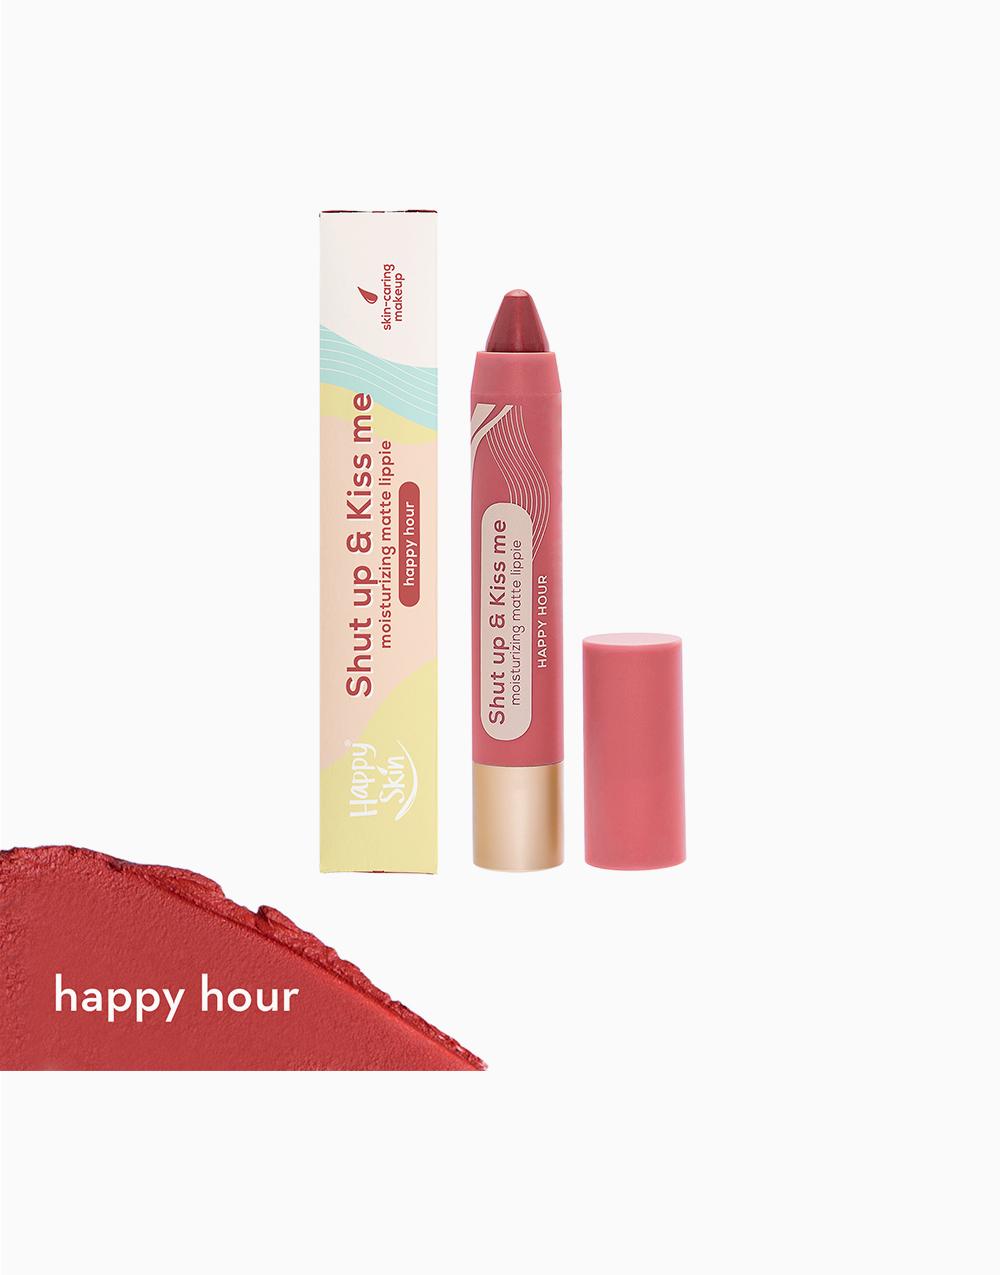 Shut Up & Kiss me Moisturizing Matte Lippie by Happy Skin   Happy Hour